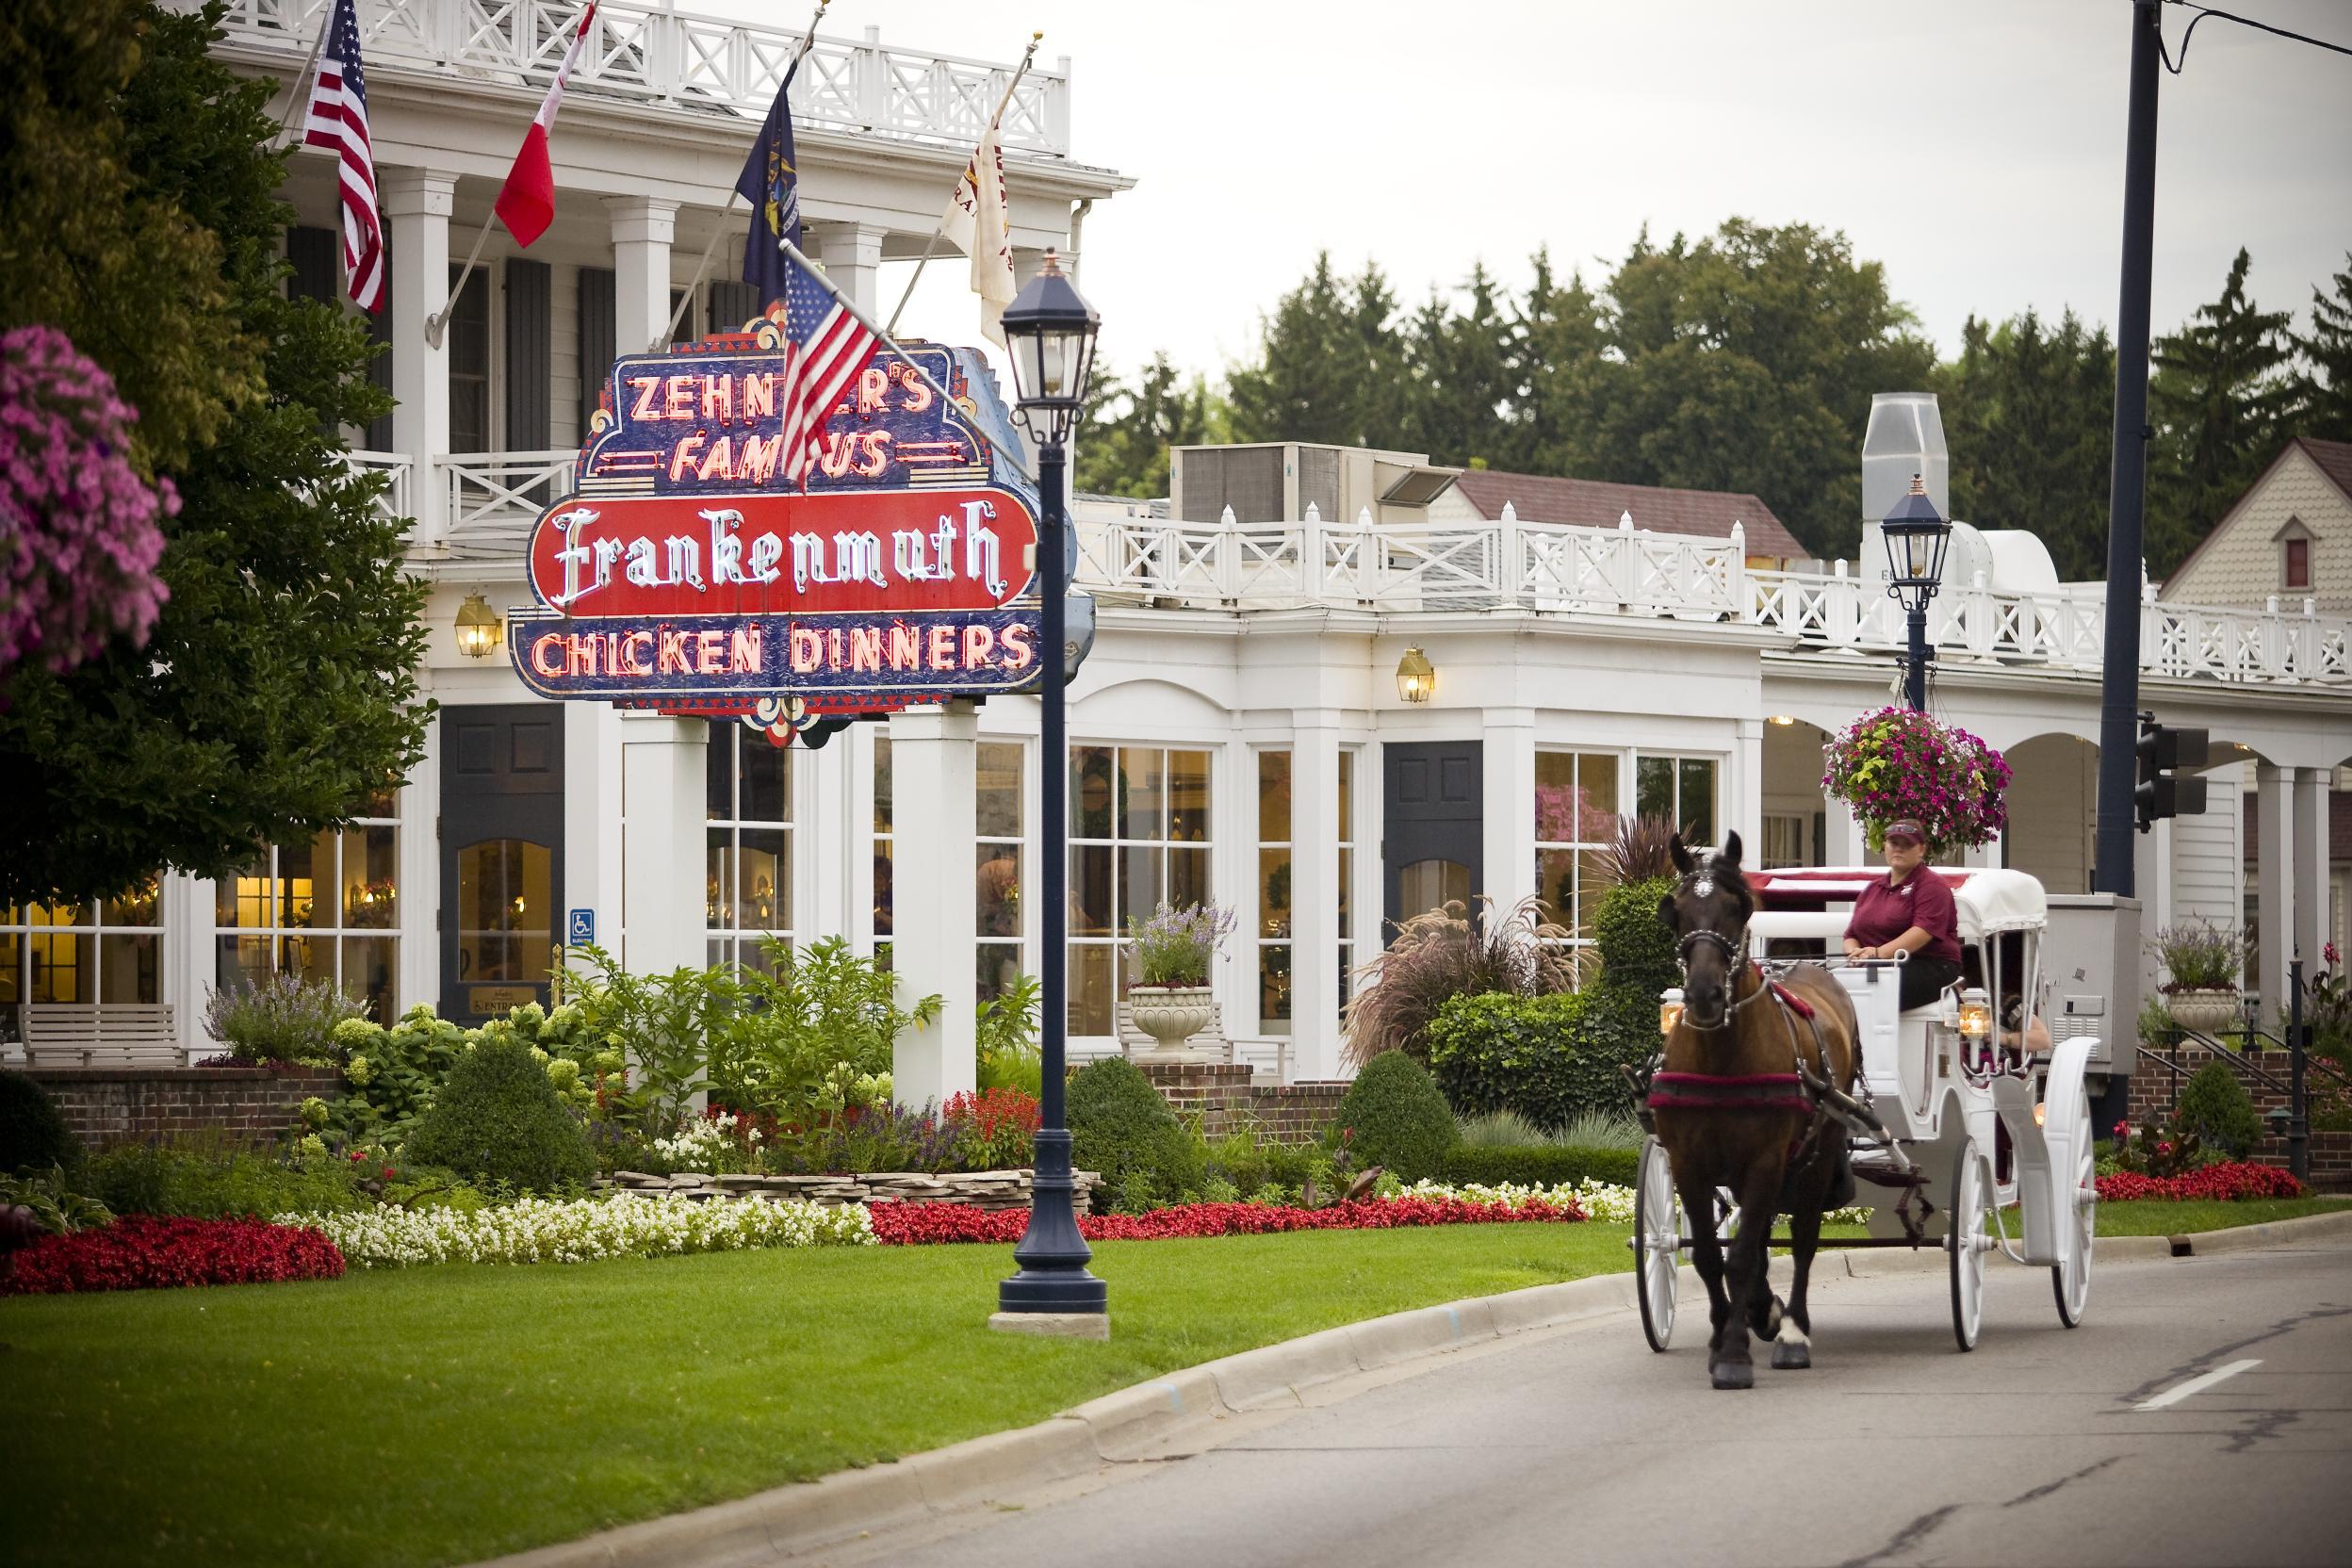 Horse and buggy outside Zehnder's